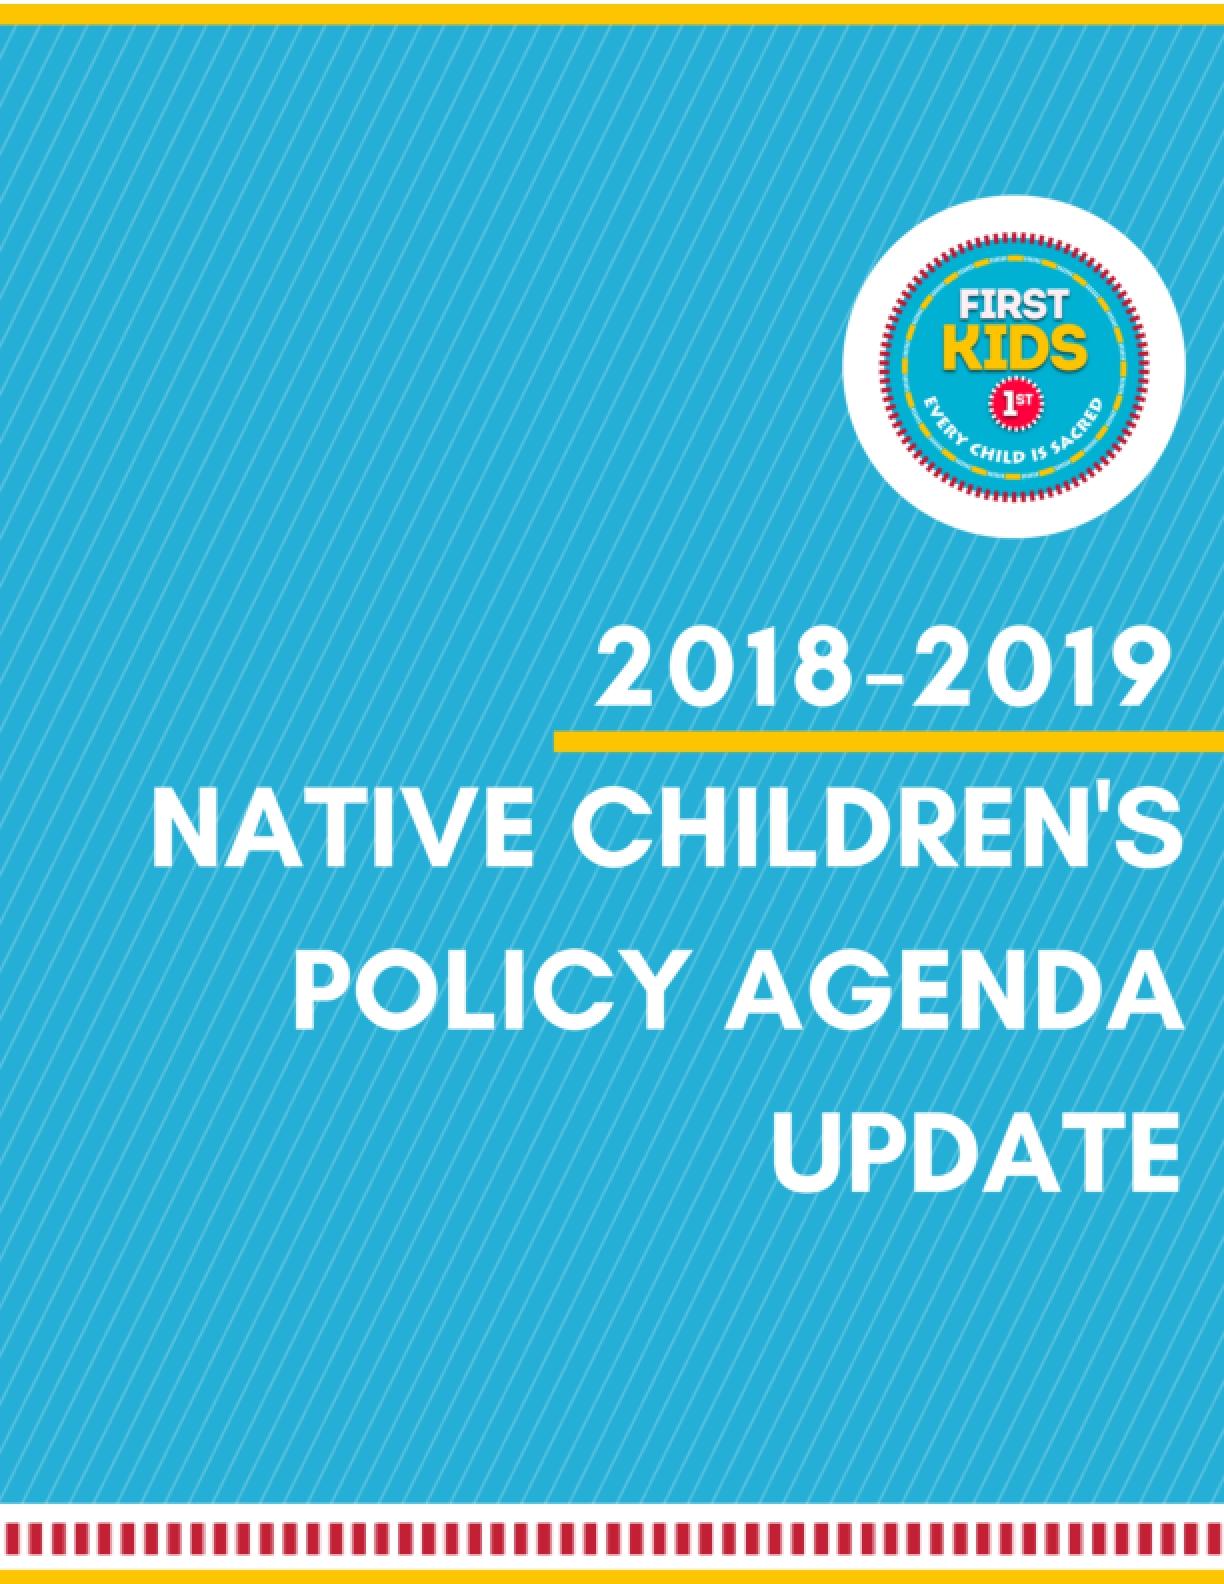 Native Children's Policy Agenda: 2018-2019 UPDATE